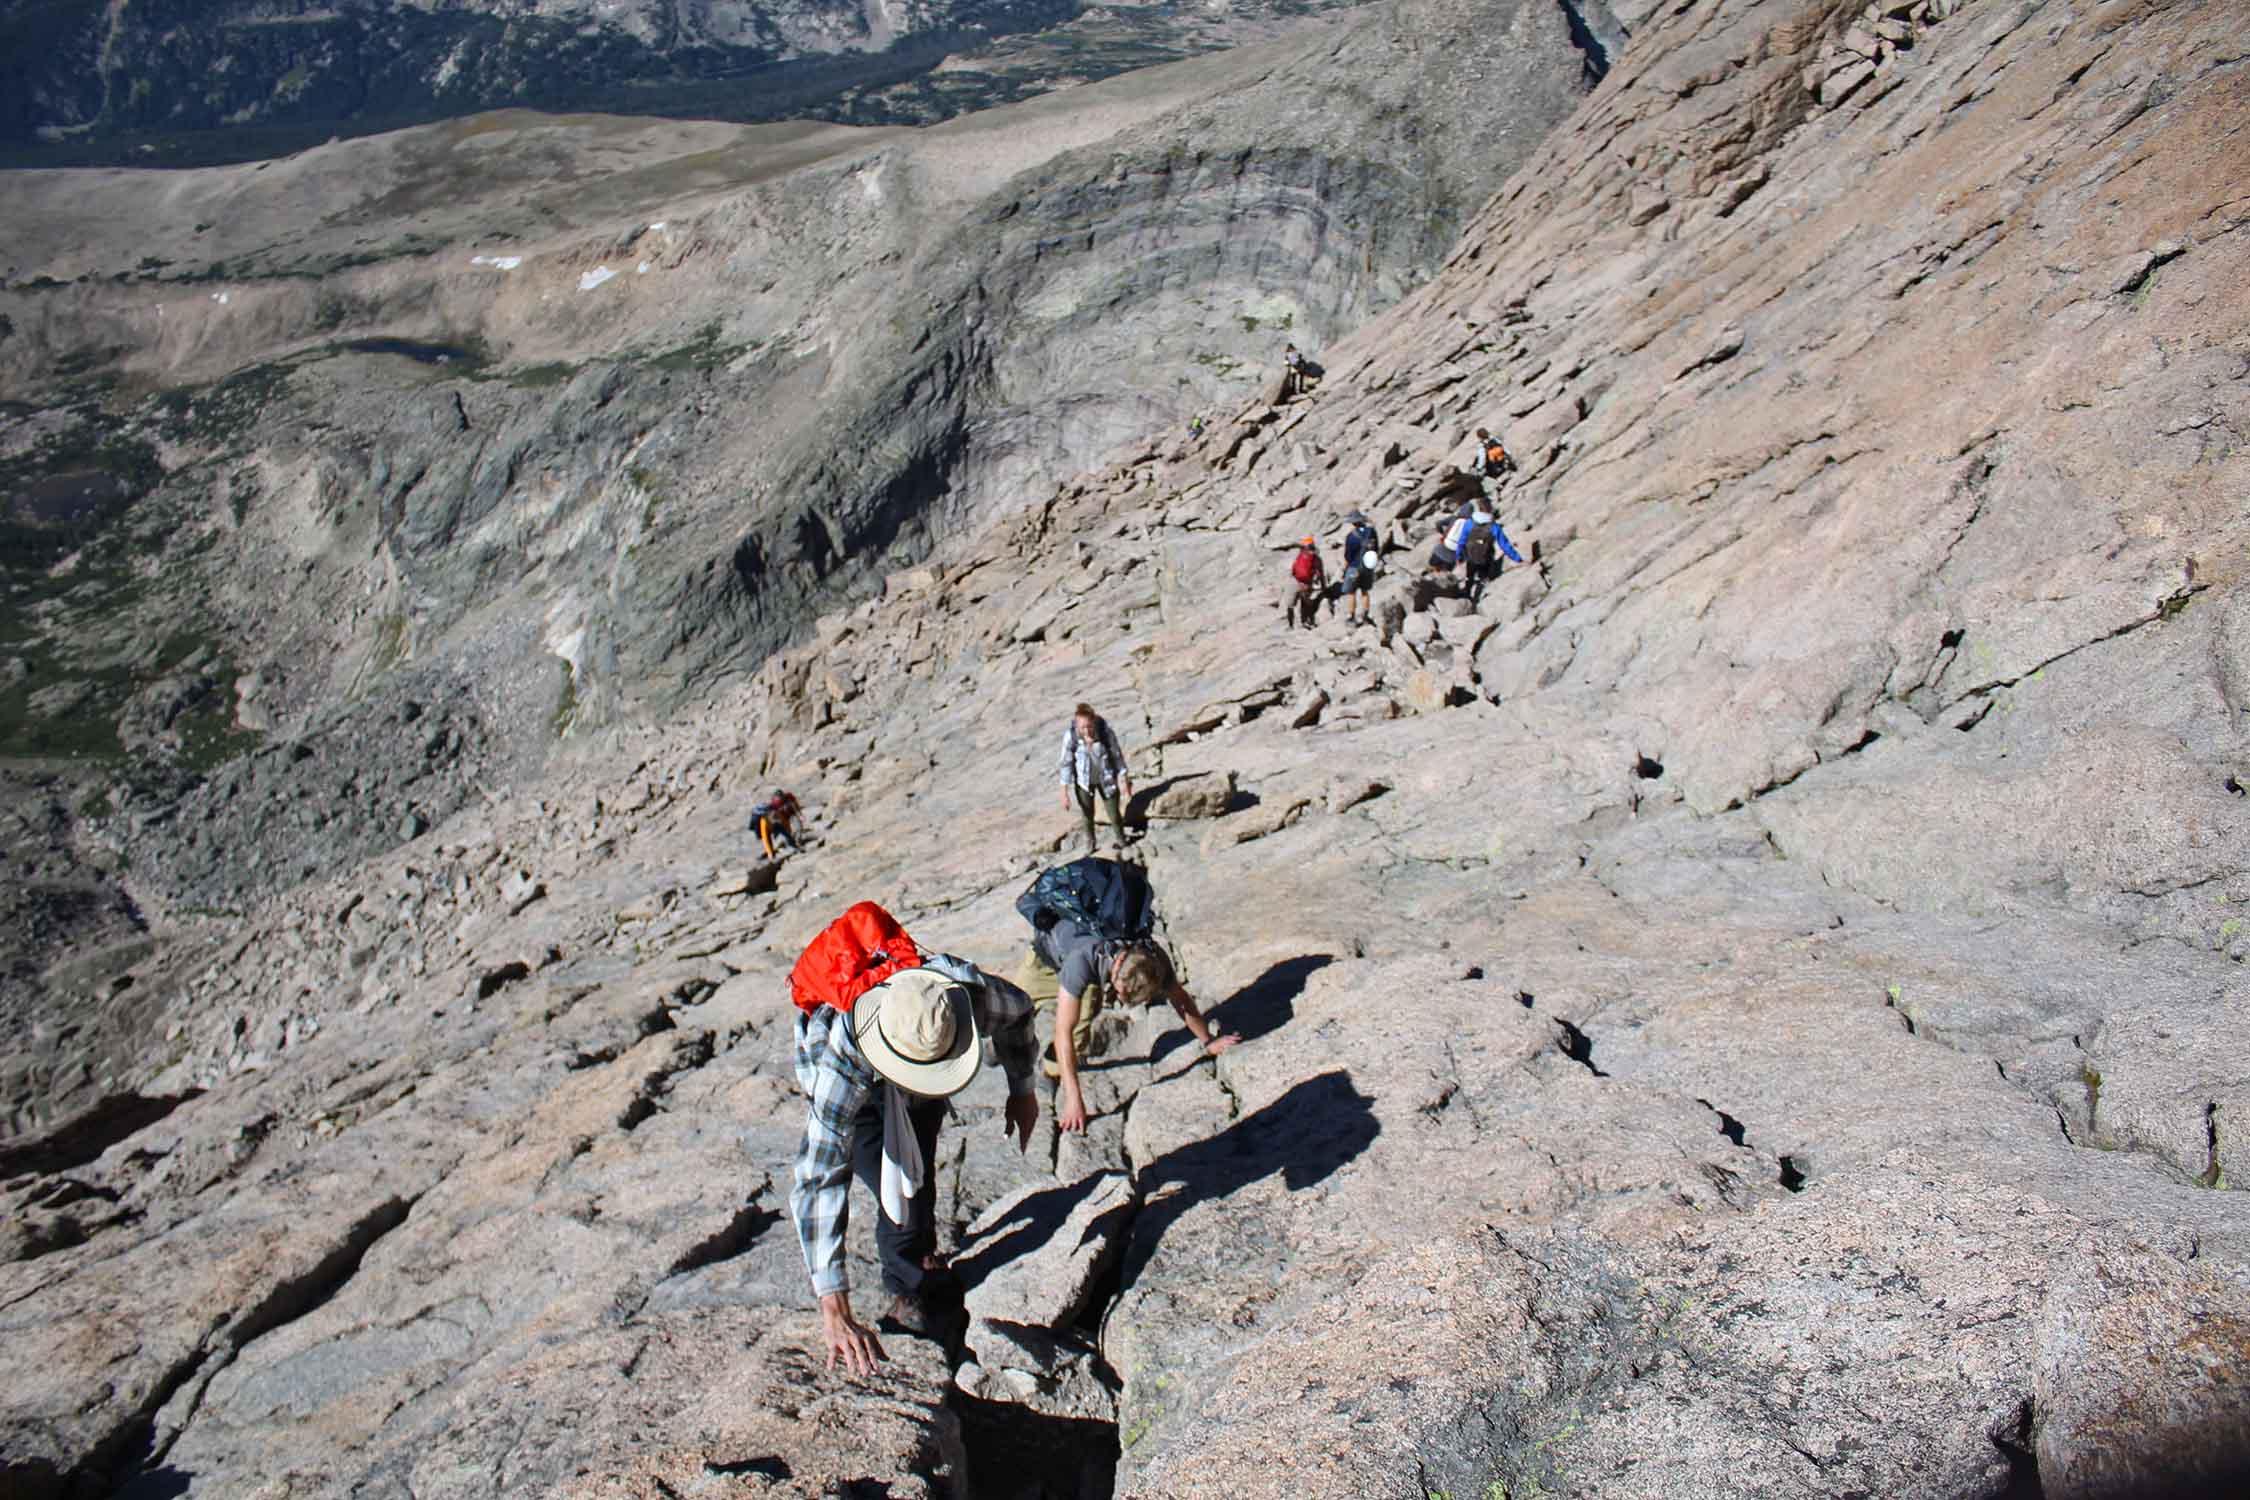 Hiking up Longs Peak in Rocky Mountain National Park.